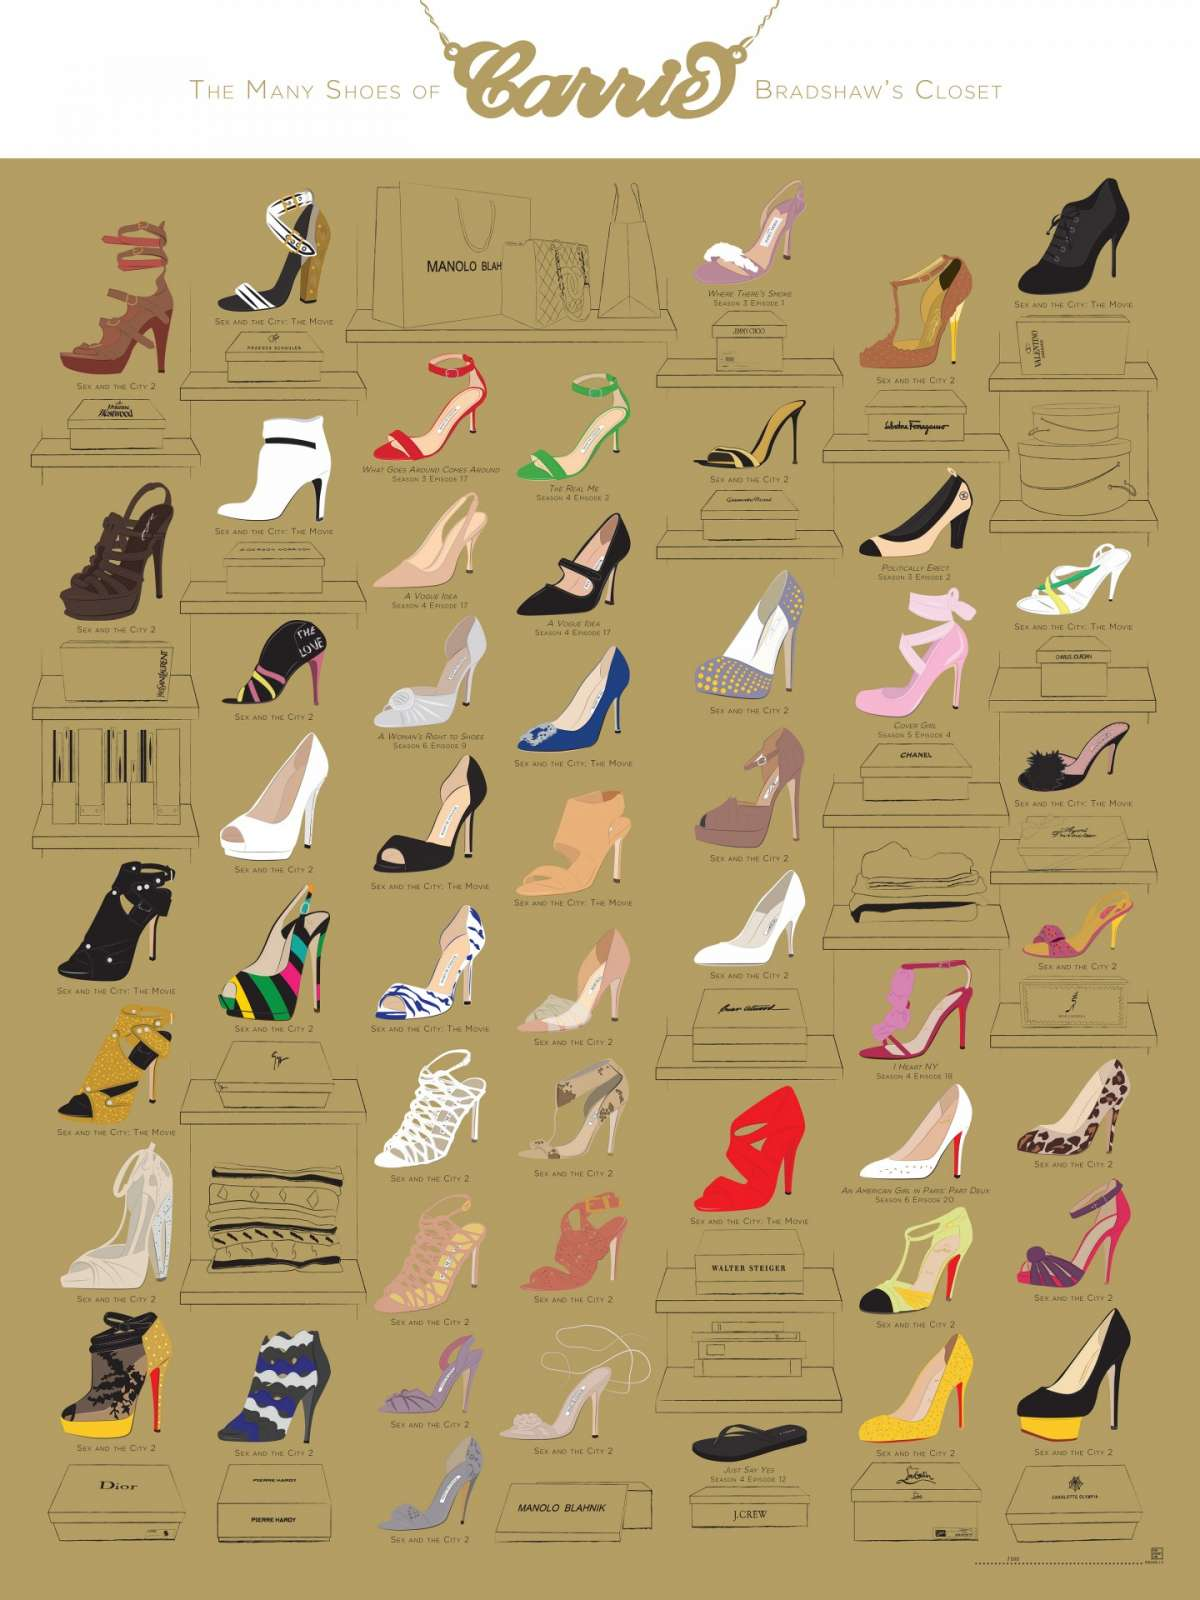 Le scarpe di Carrie Bradwshaw